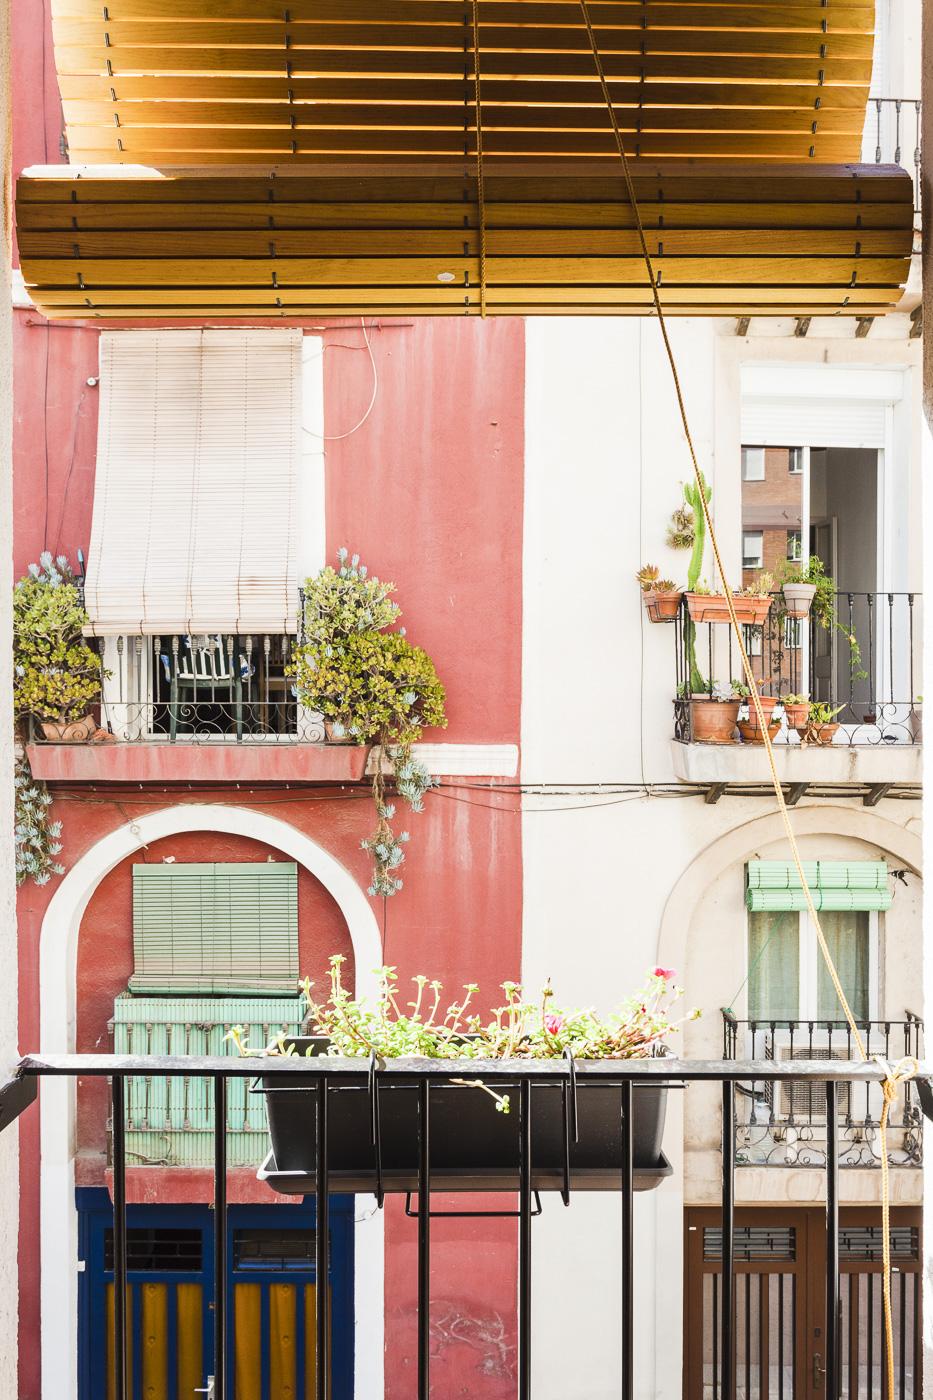 annaortega_arquitecturatecnica_llatzeret_poblenou_barcelona (5)